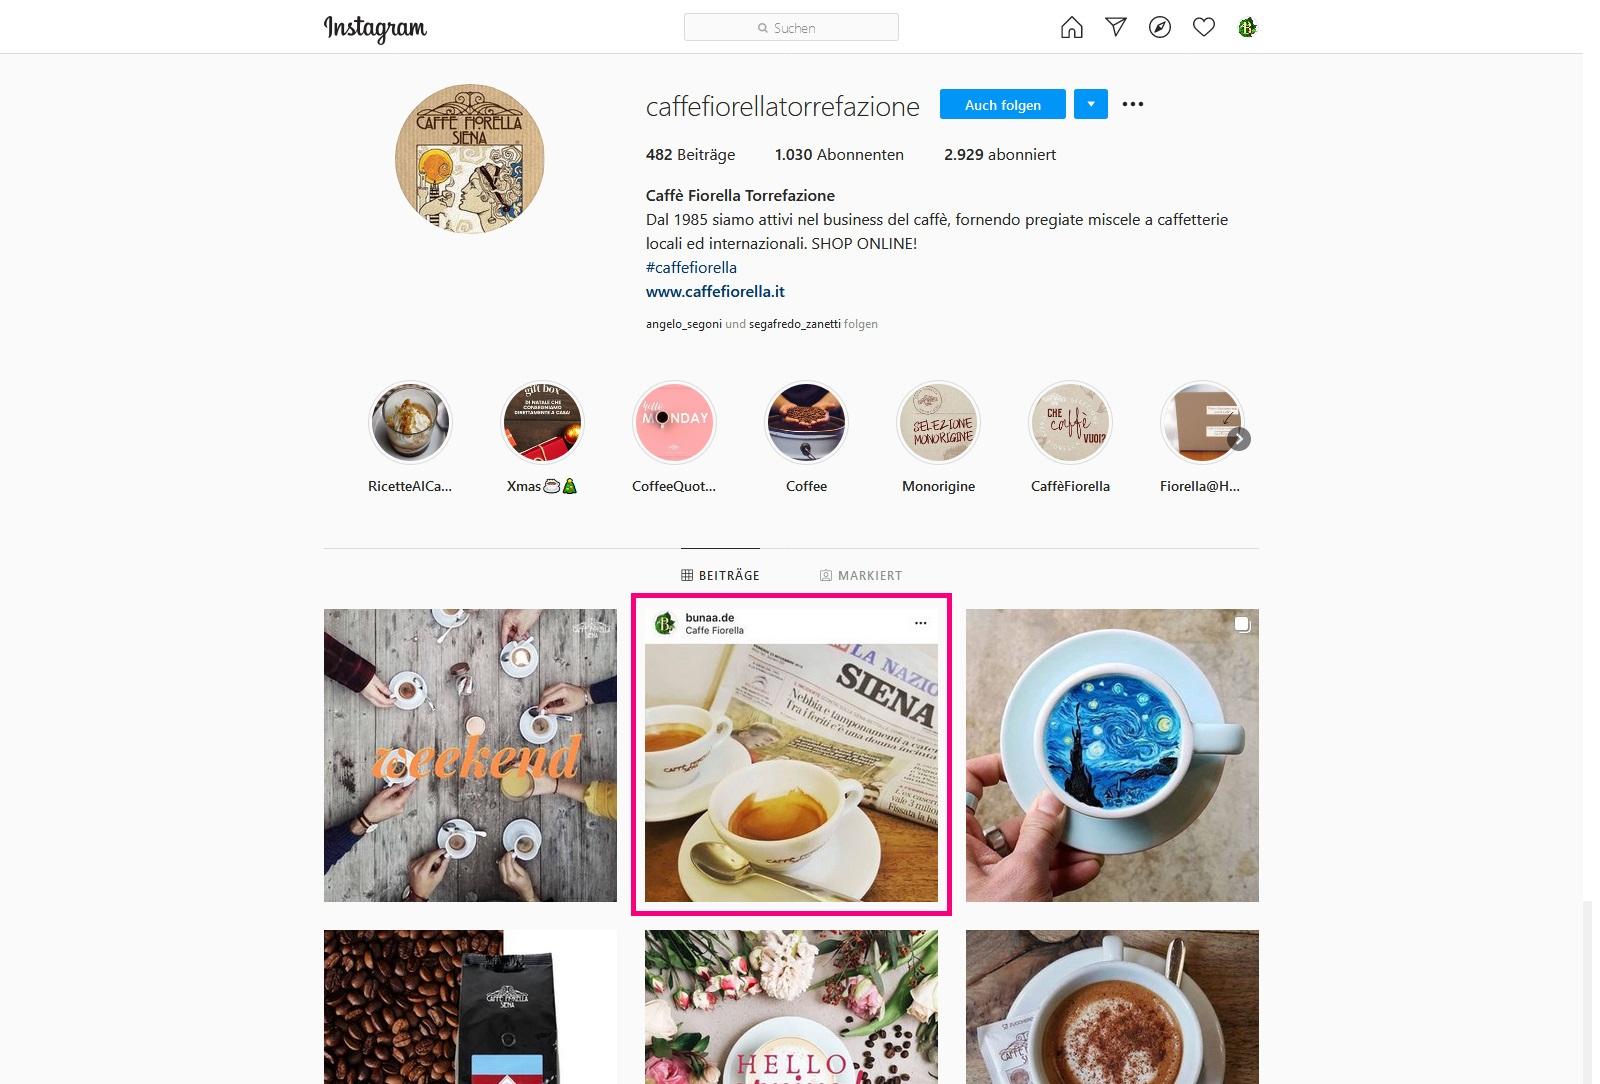 Bunaa - Caffe Fiorella Instagram